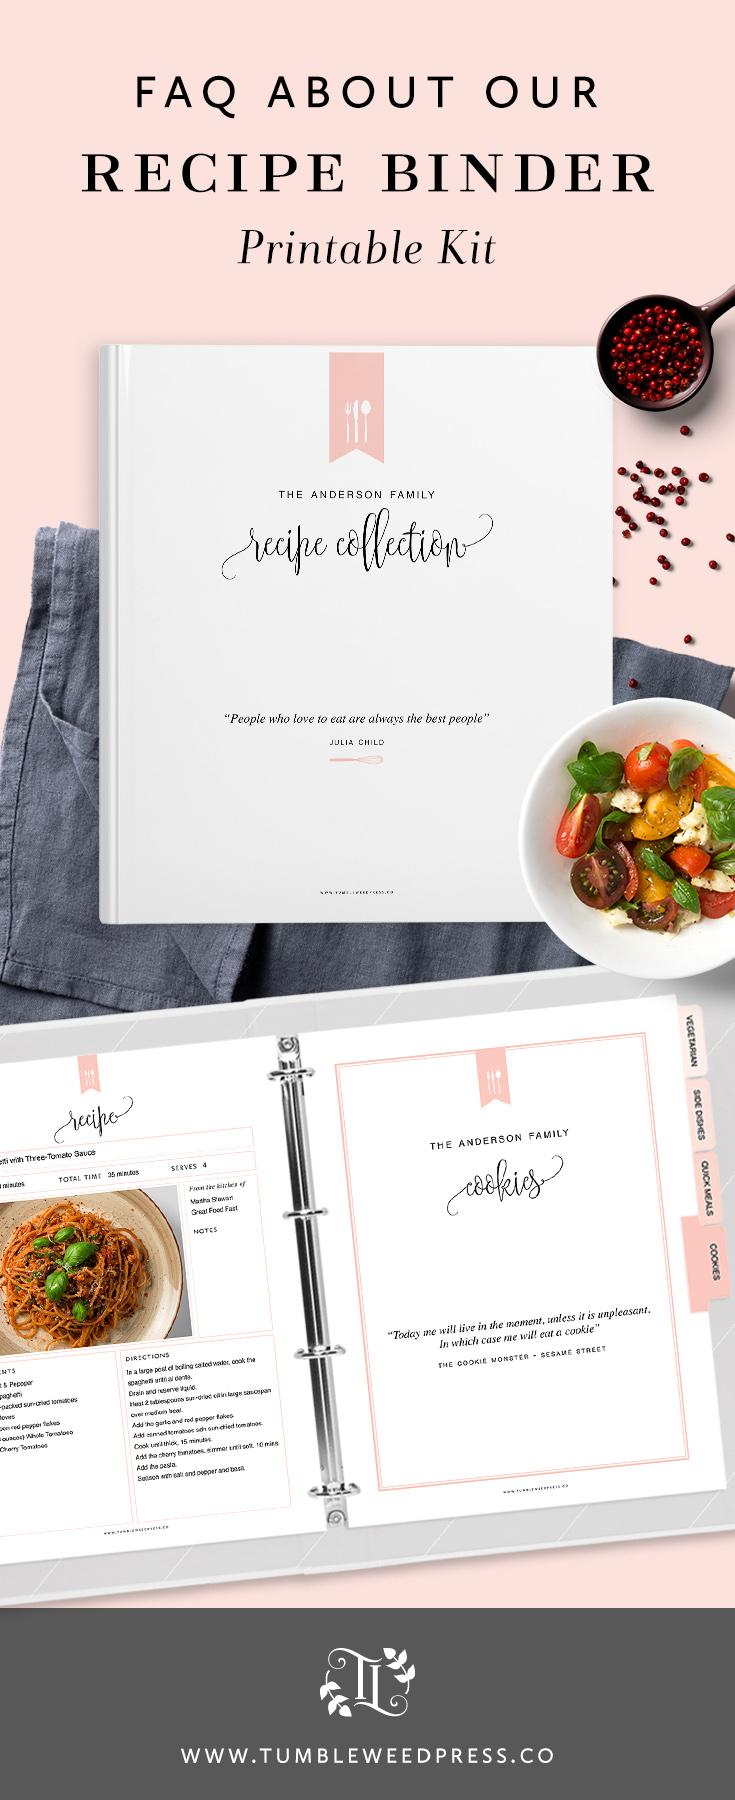 Recipe Binder Printable Kit FAQ Answered by TumbleweedPress.Co